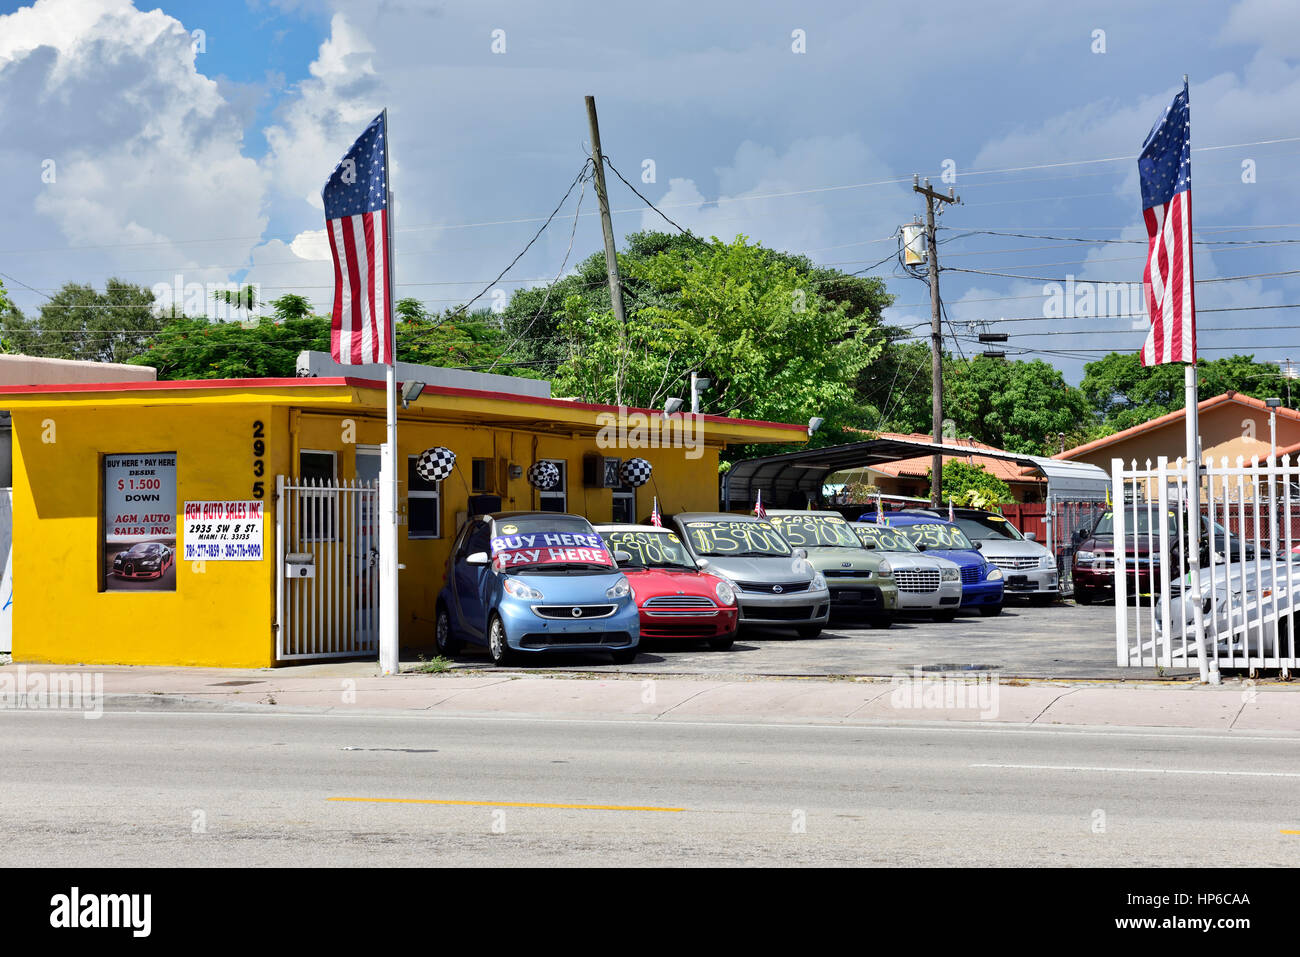 American used car lot Stock Photo: 134136418 - Alamy